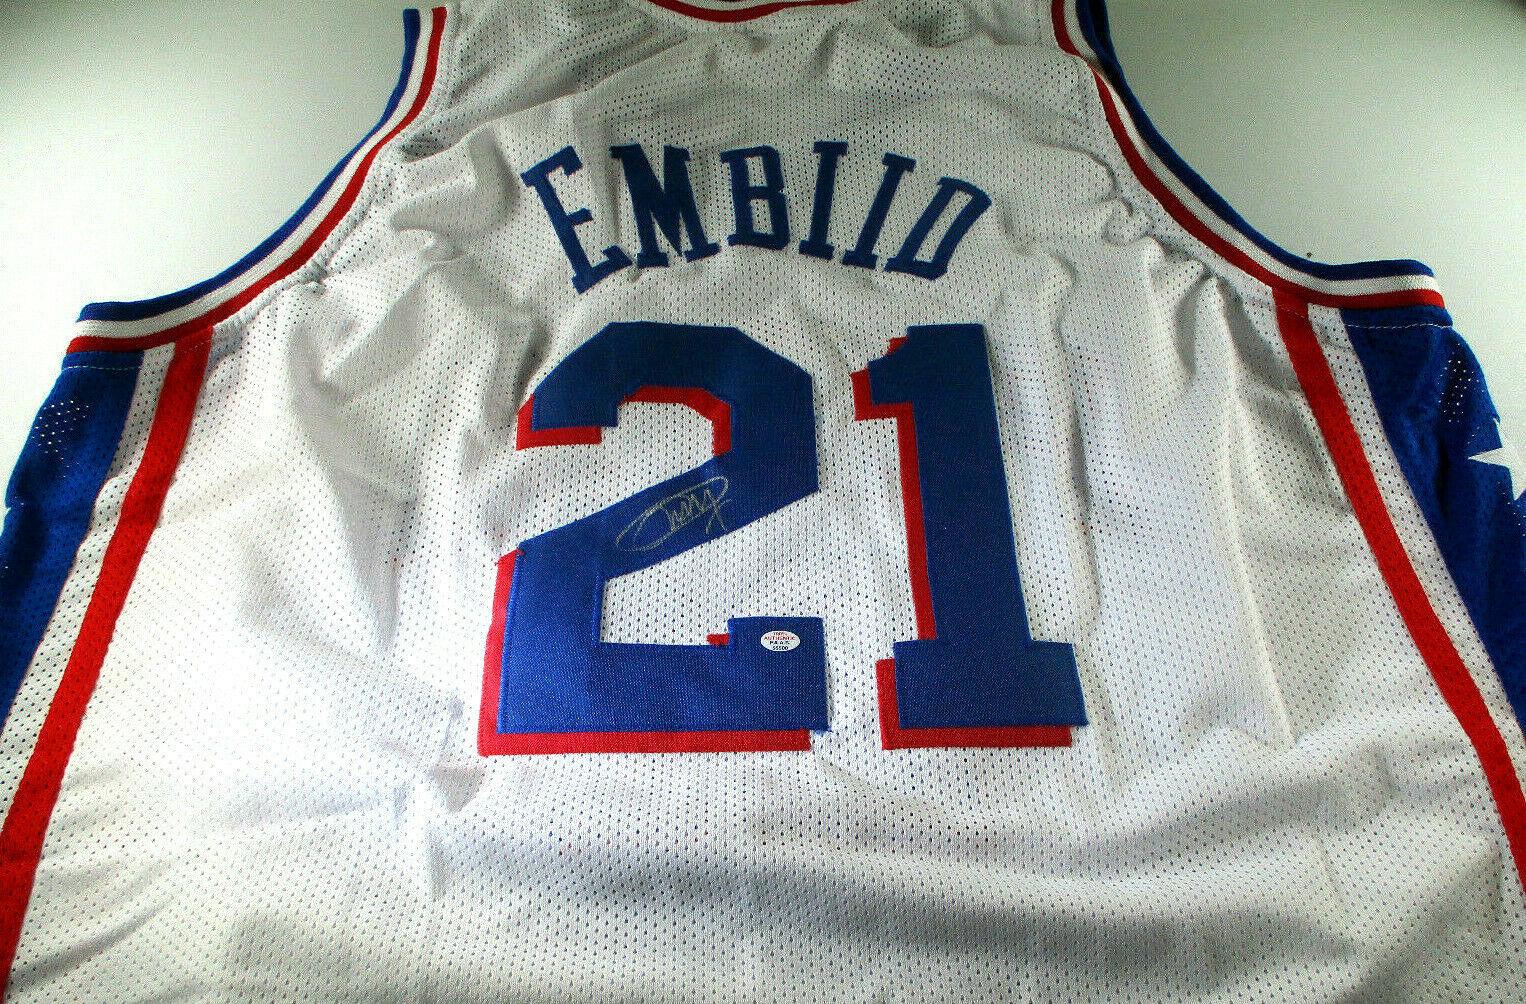 JOEL EMBIID / 2021 NBA ALL-STAR / AUTOGRAPHED 76ERS WHITE CUSTOM JERSEY / COA